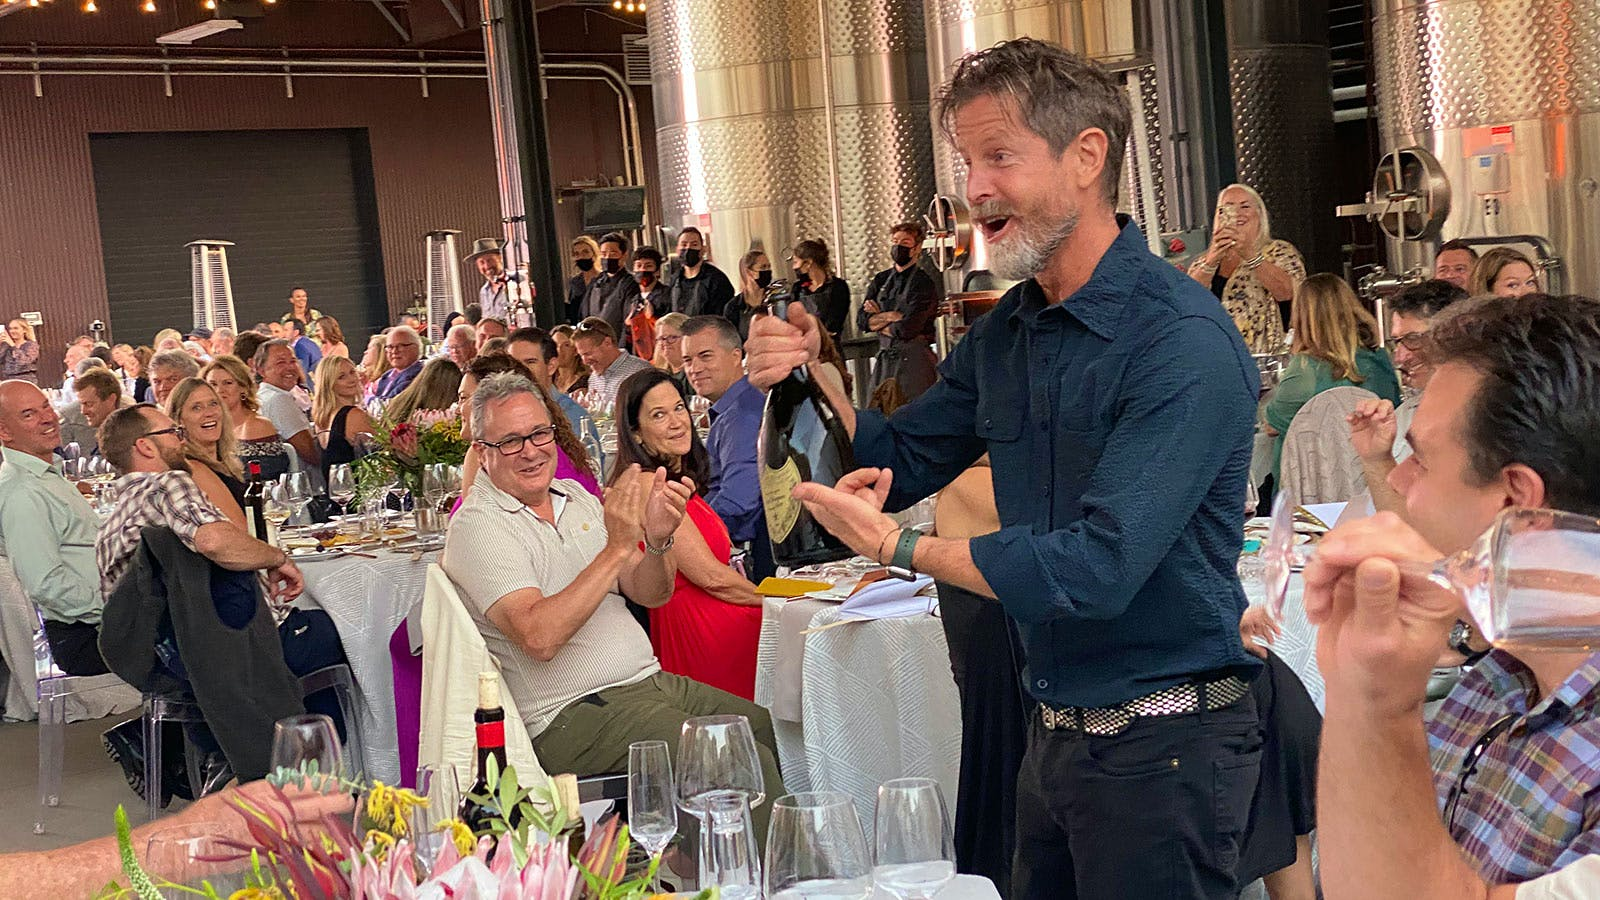 V Foundation Wine Celebration Raises $12 Million for Cancer Research